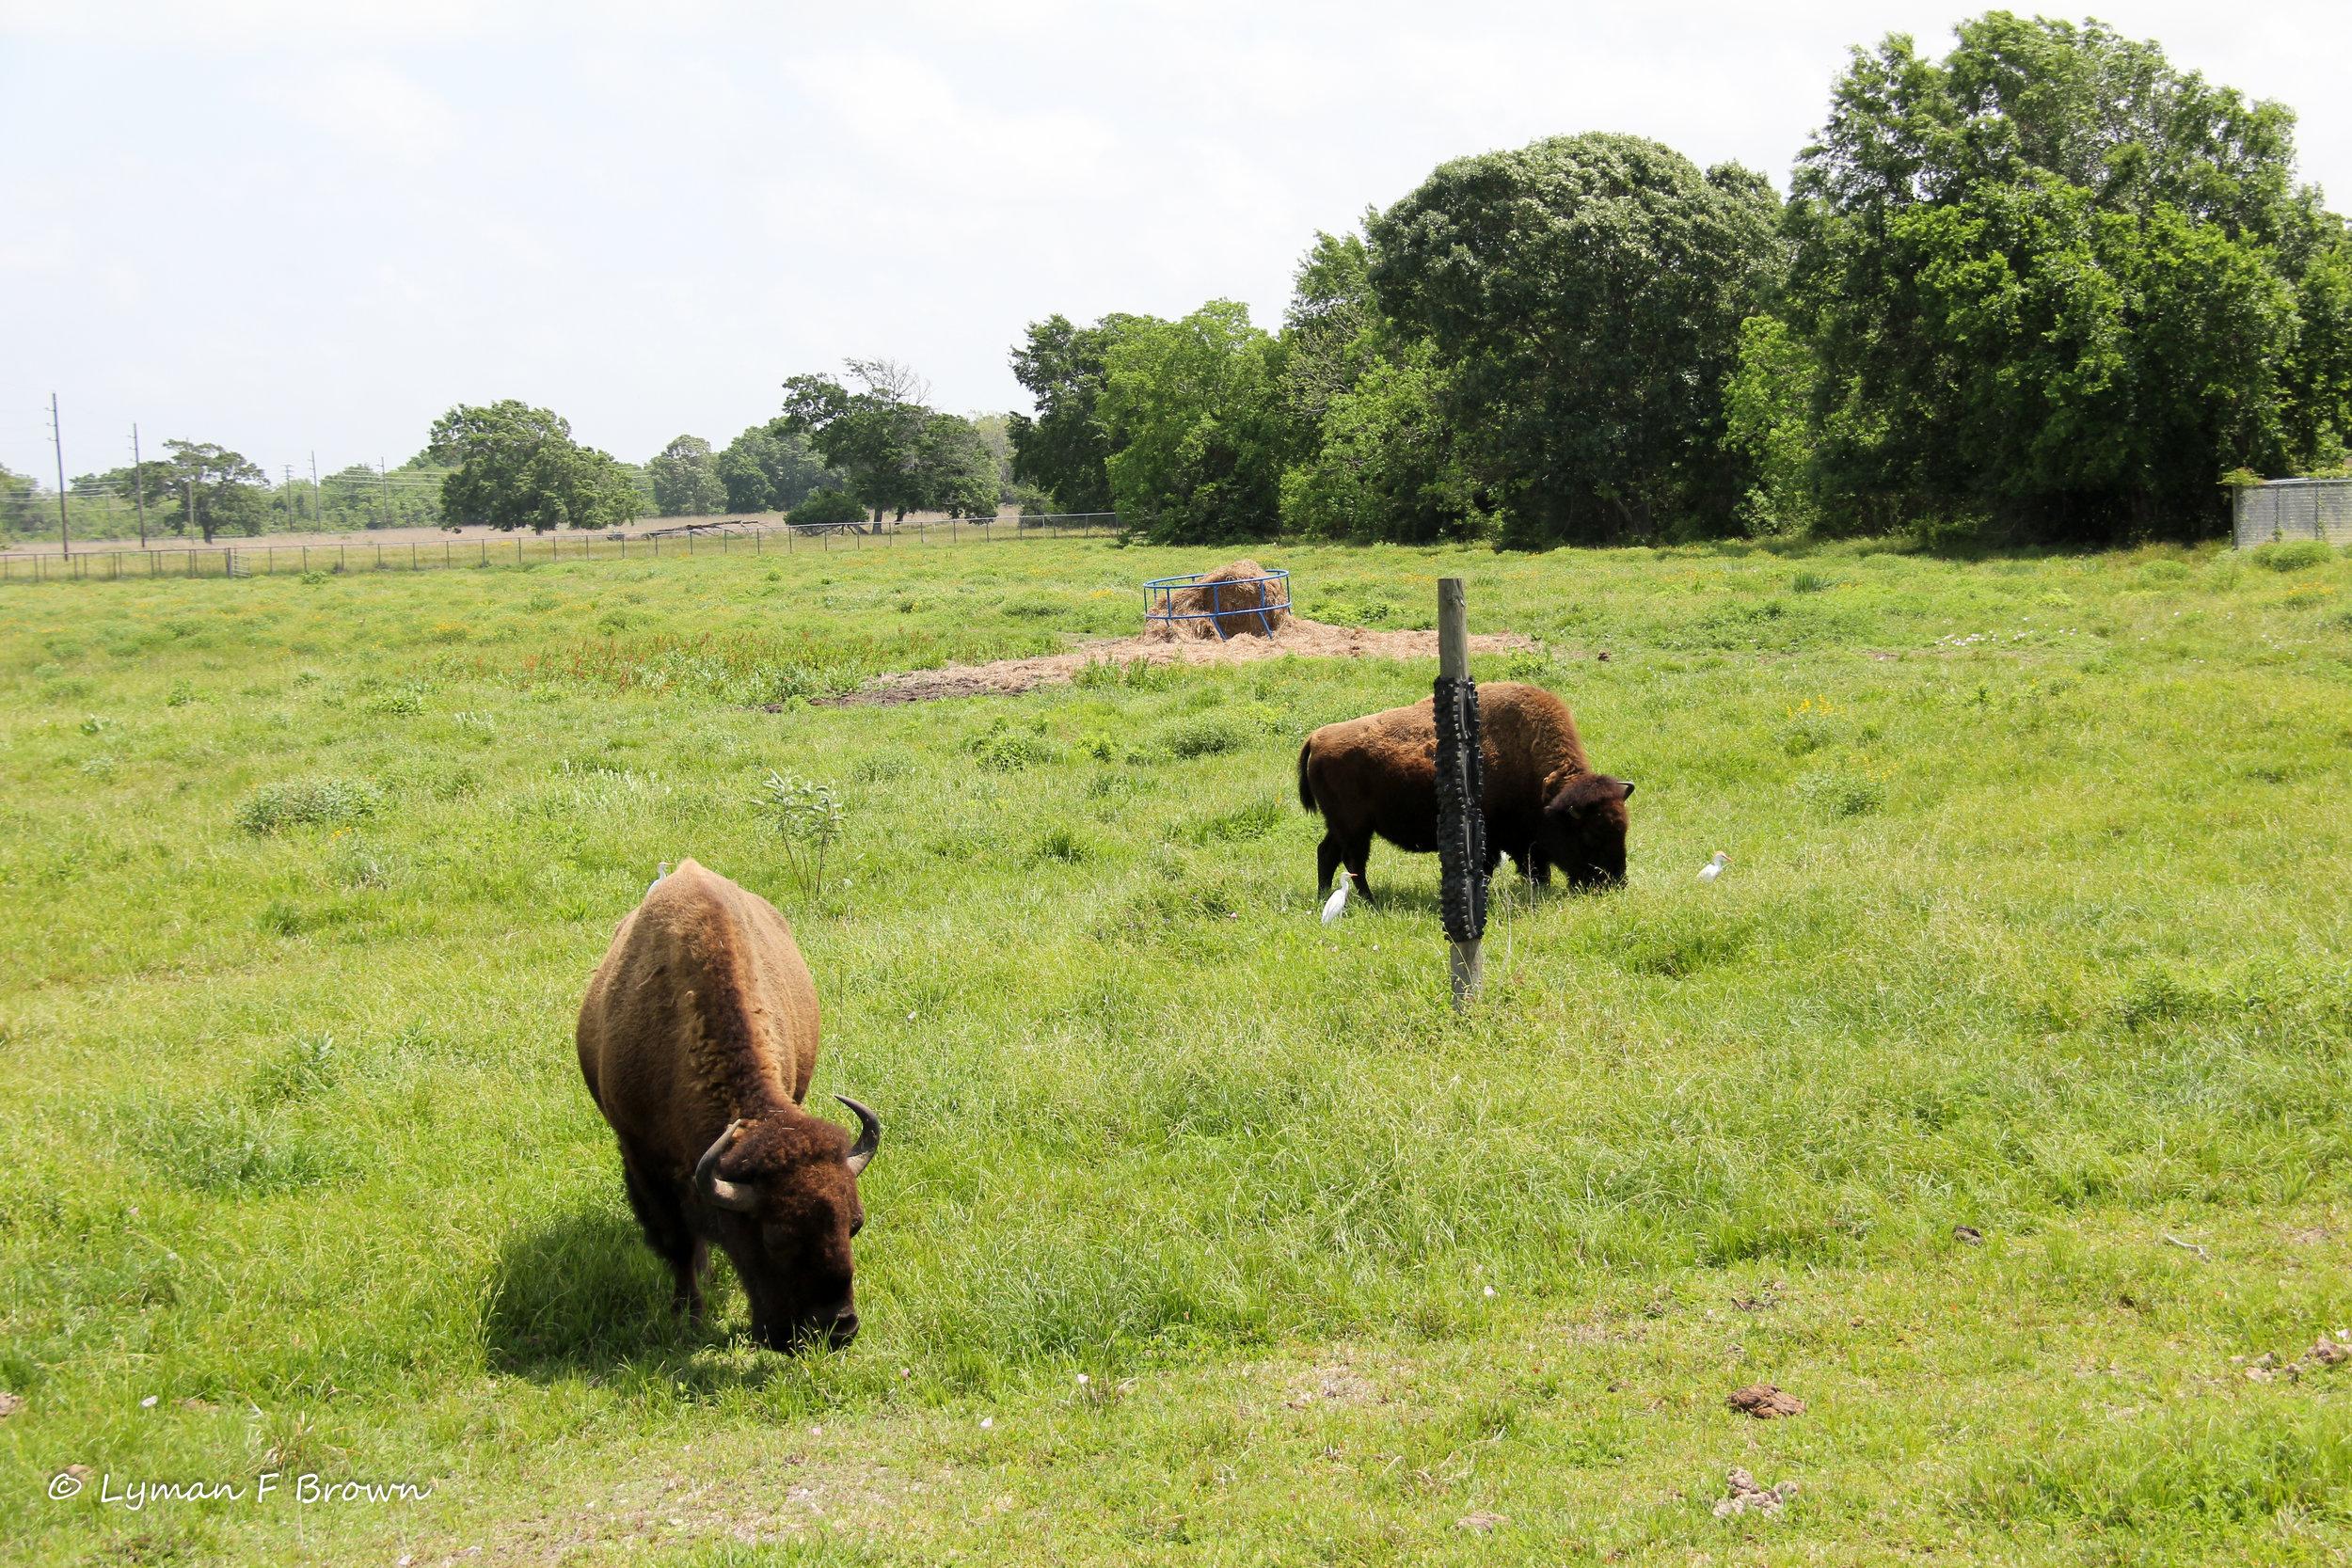 Bison - View From Bison Viewing Platform